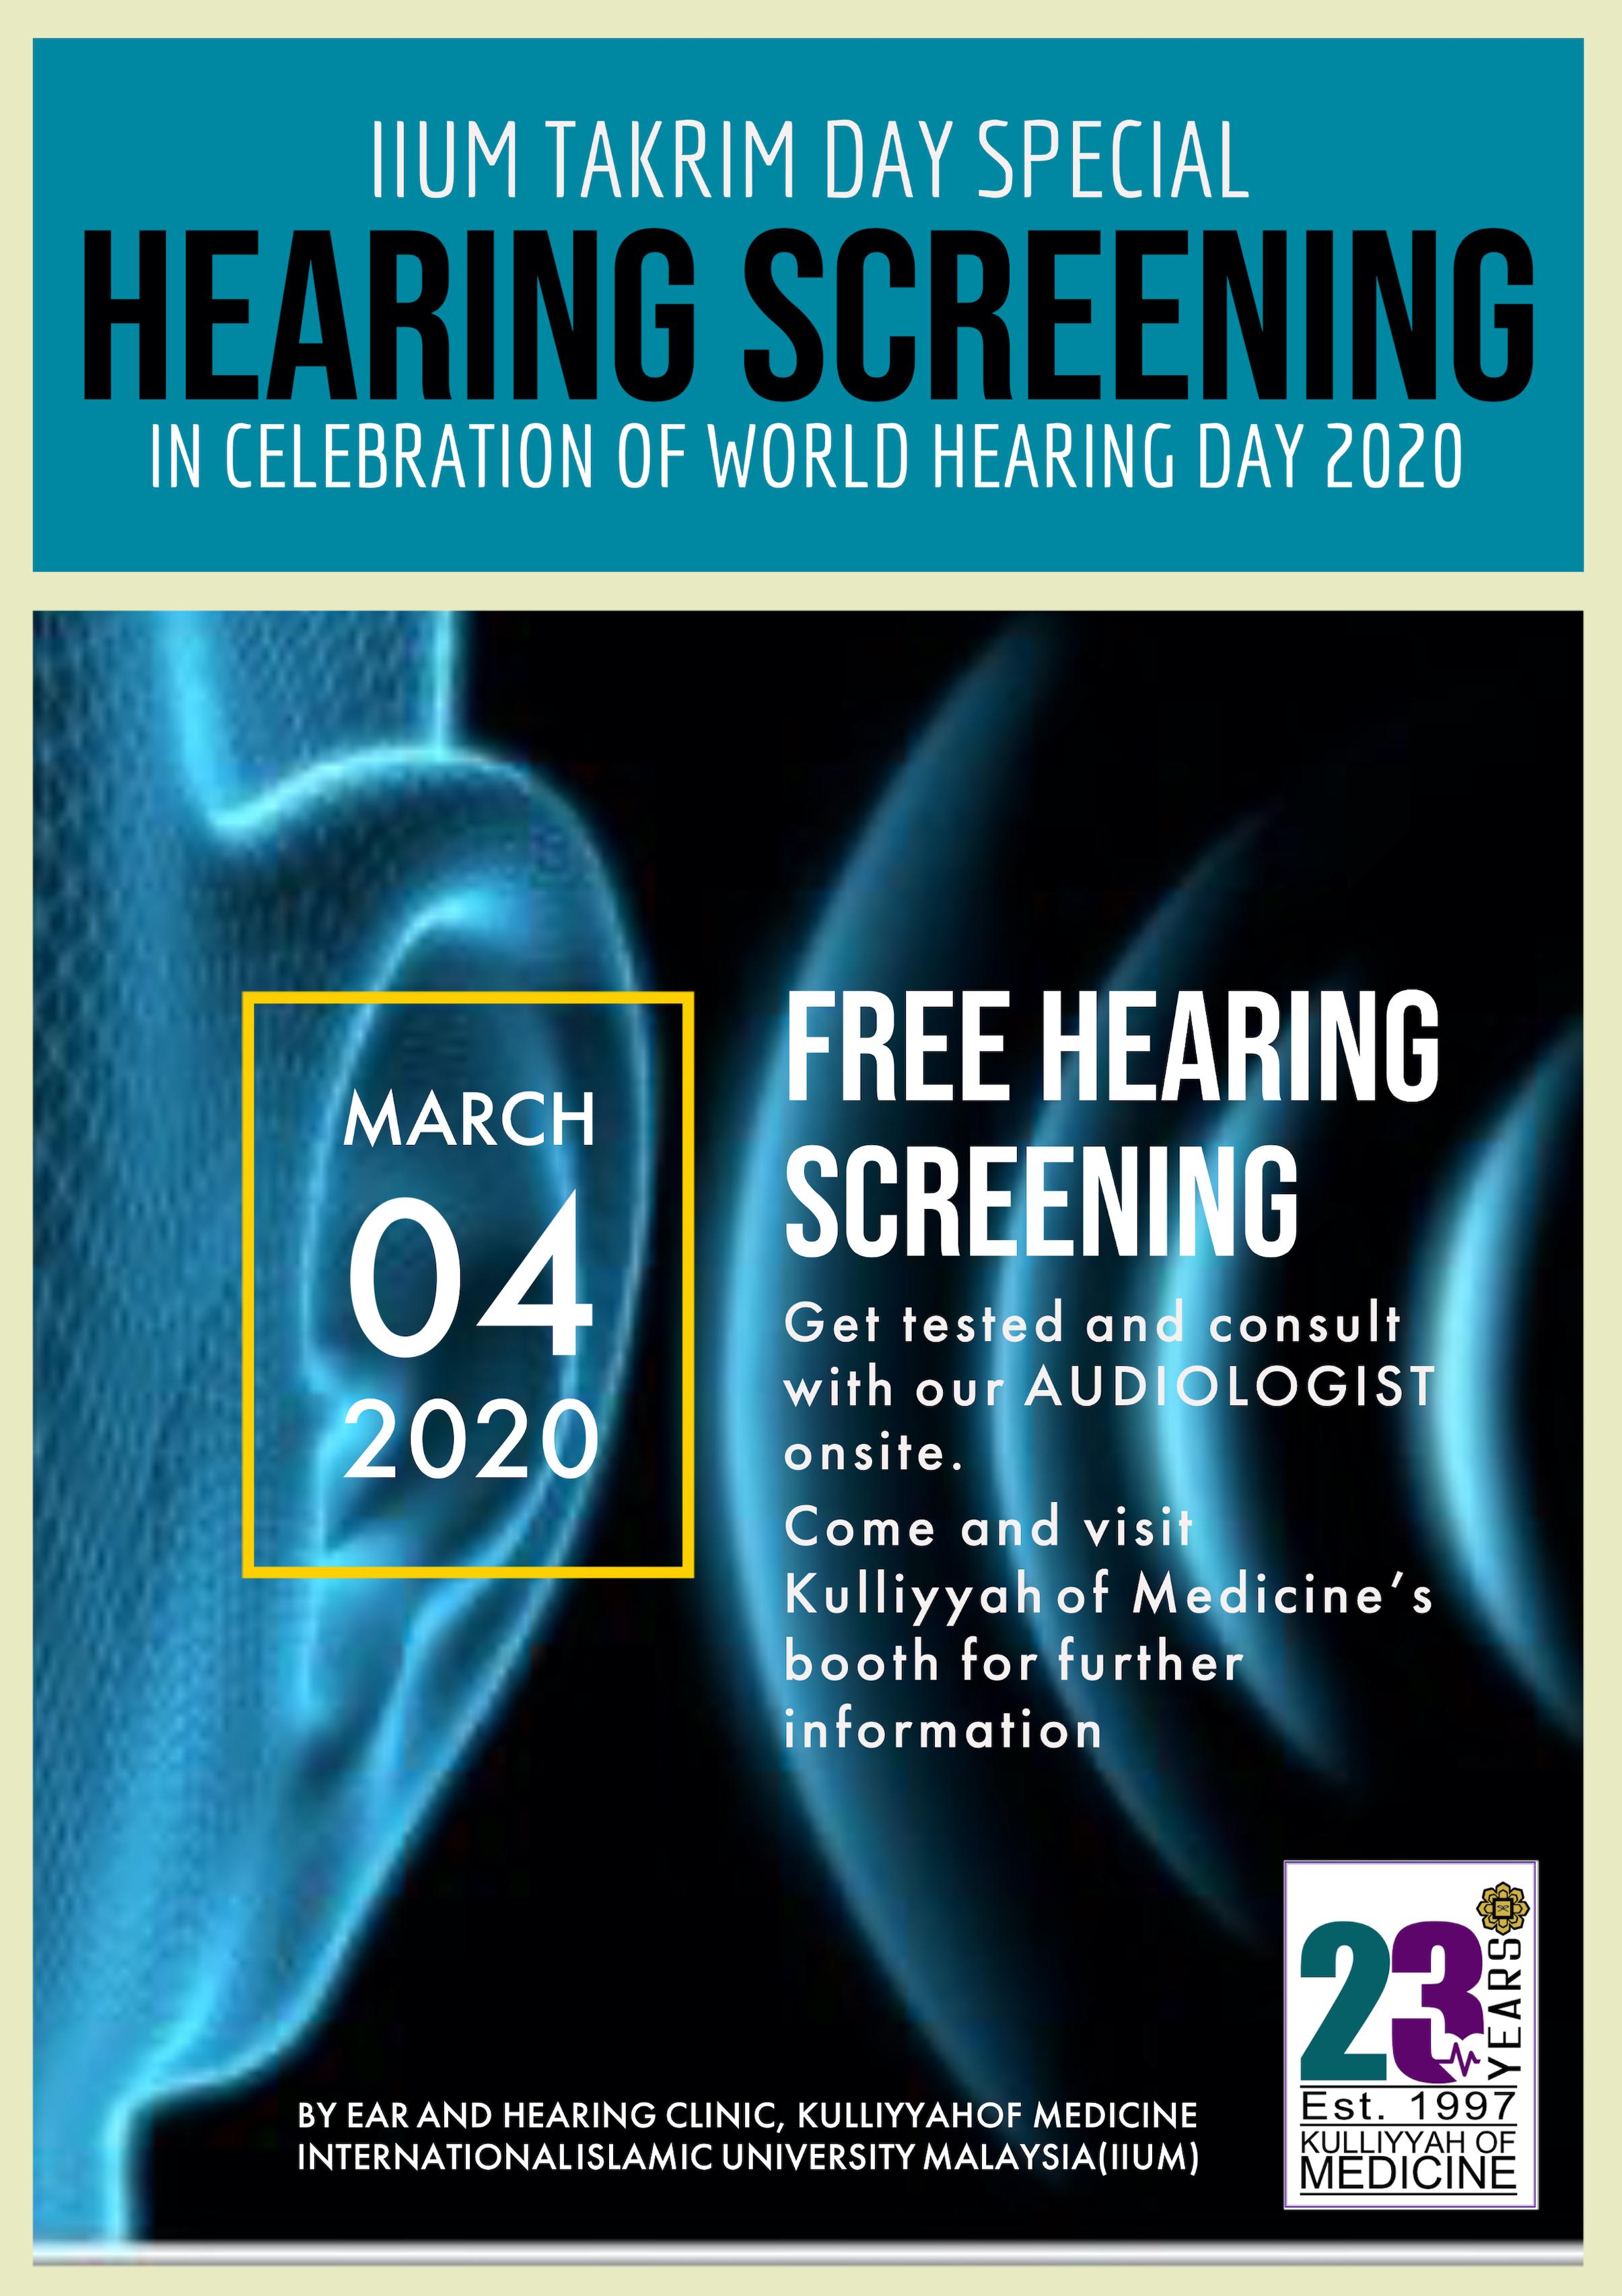 IIUM Takrim Day Special: Hearing Screening